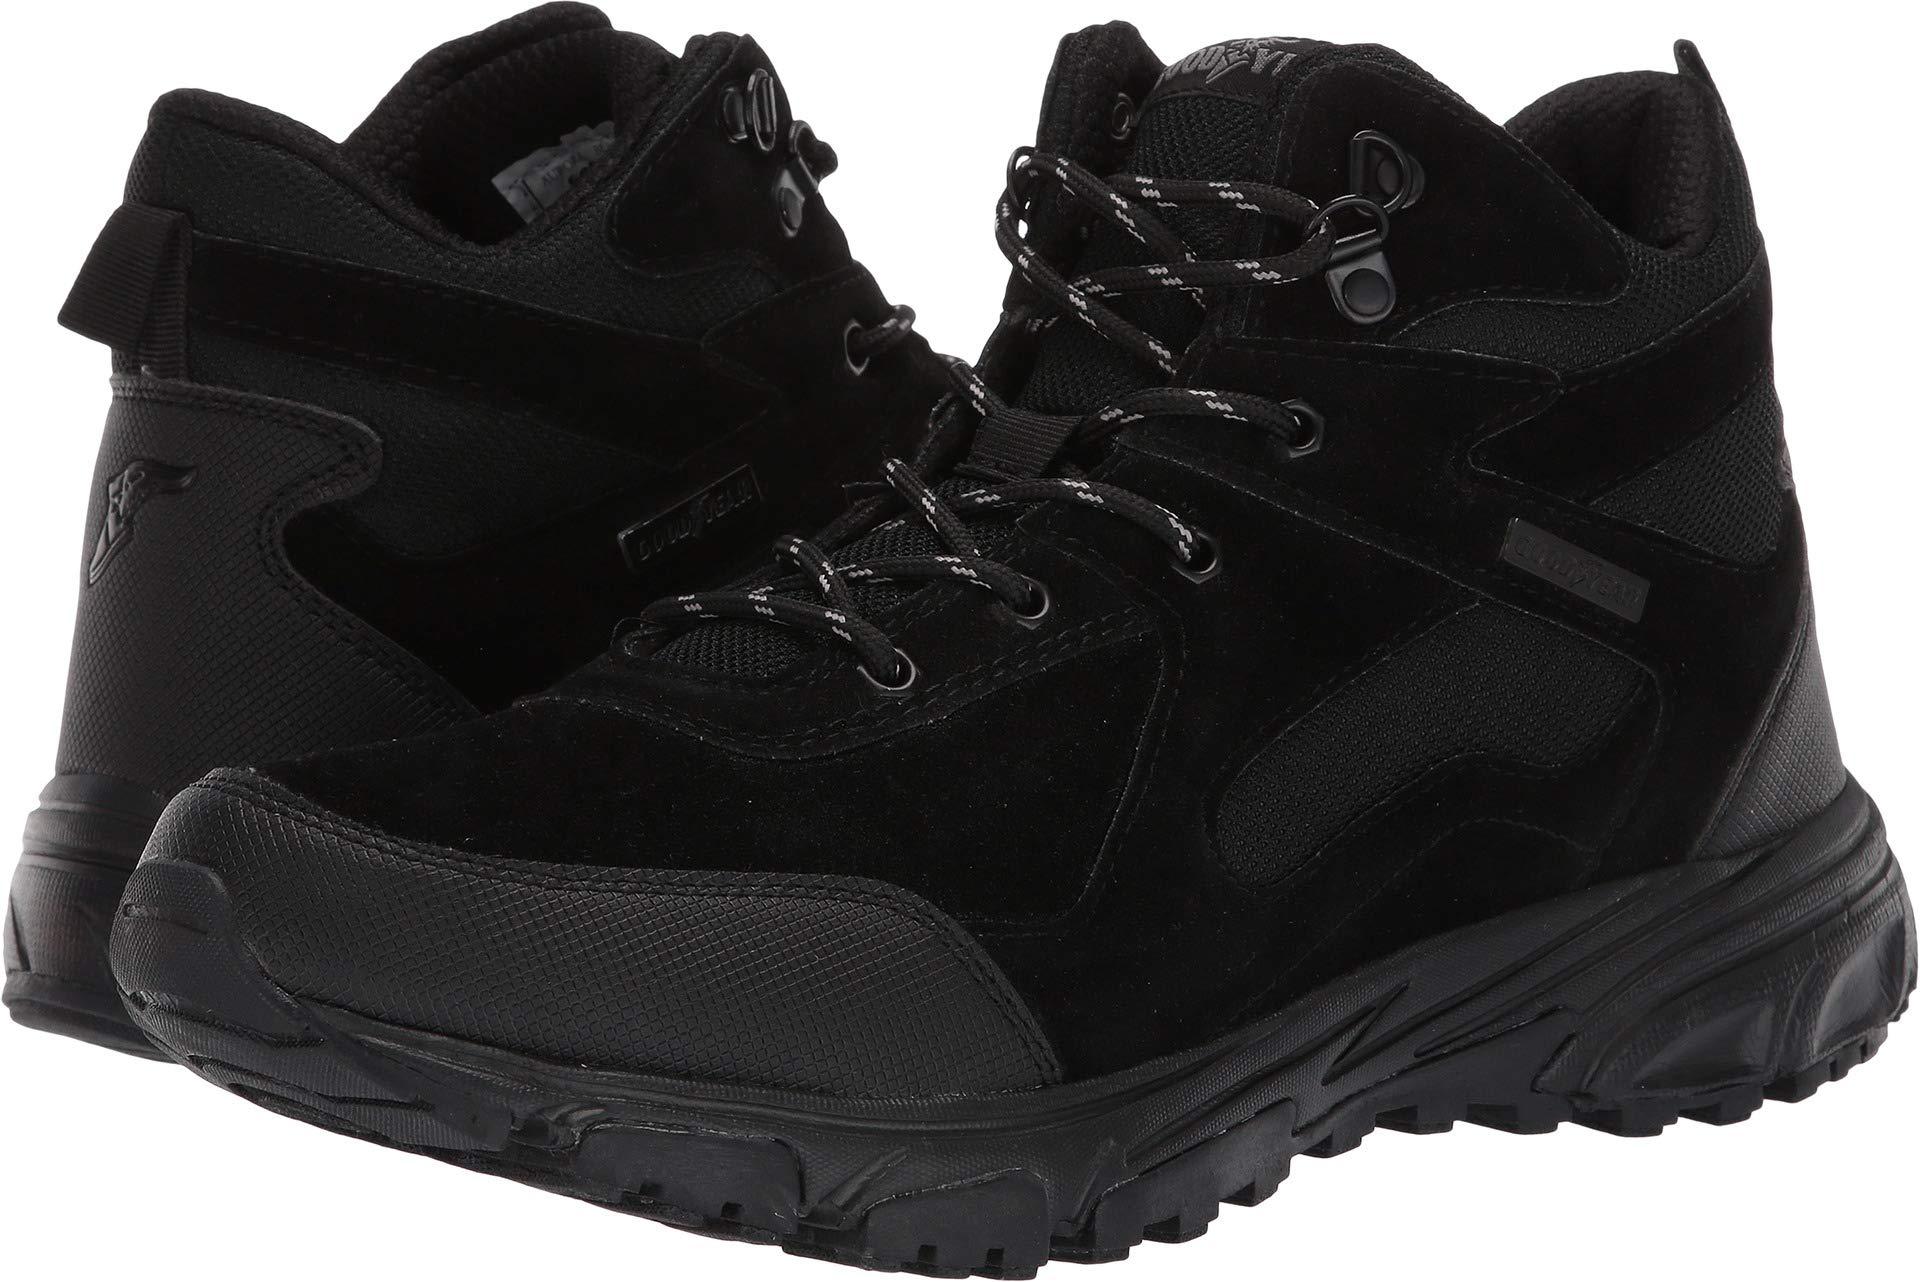 Goodyear Footwear Aurora Black/Black 10